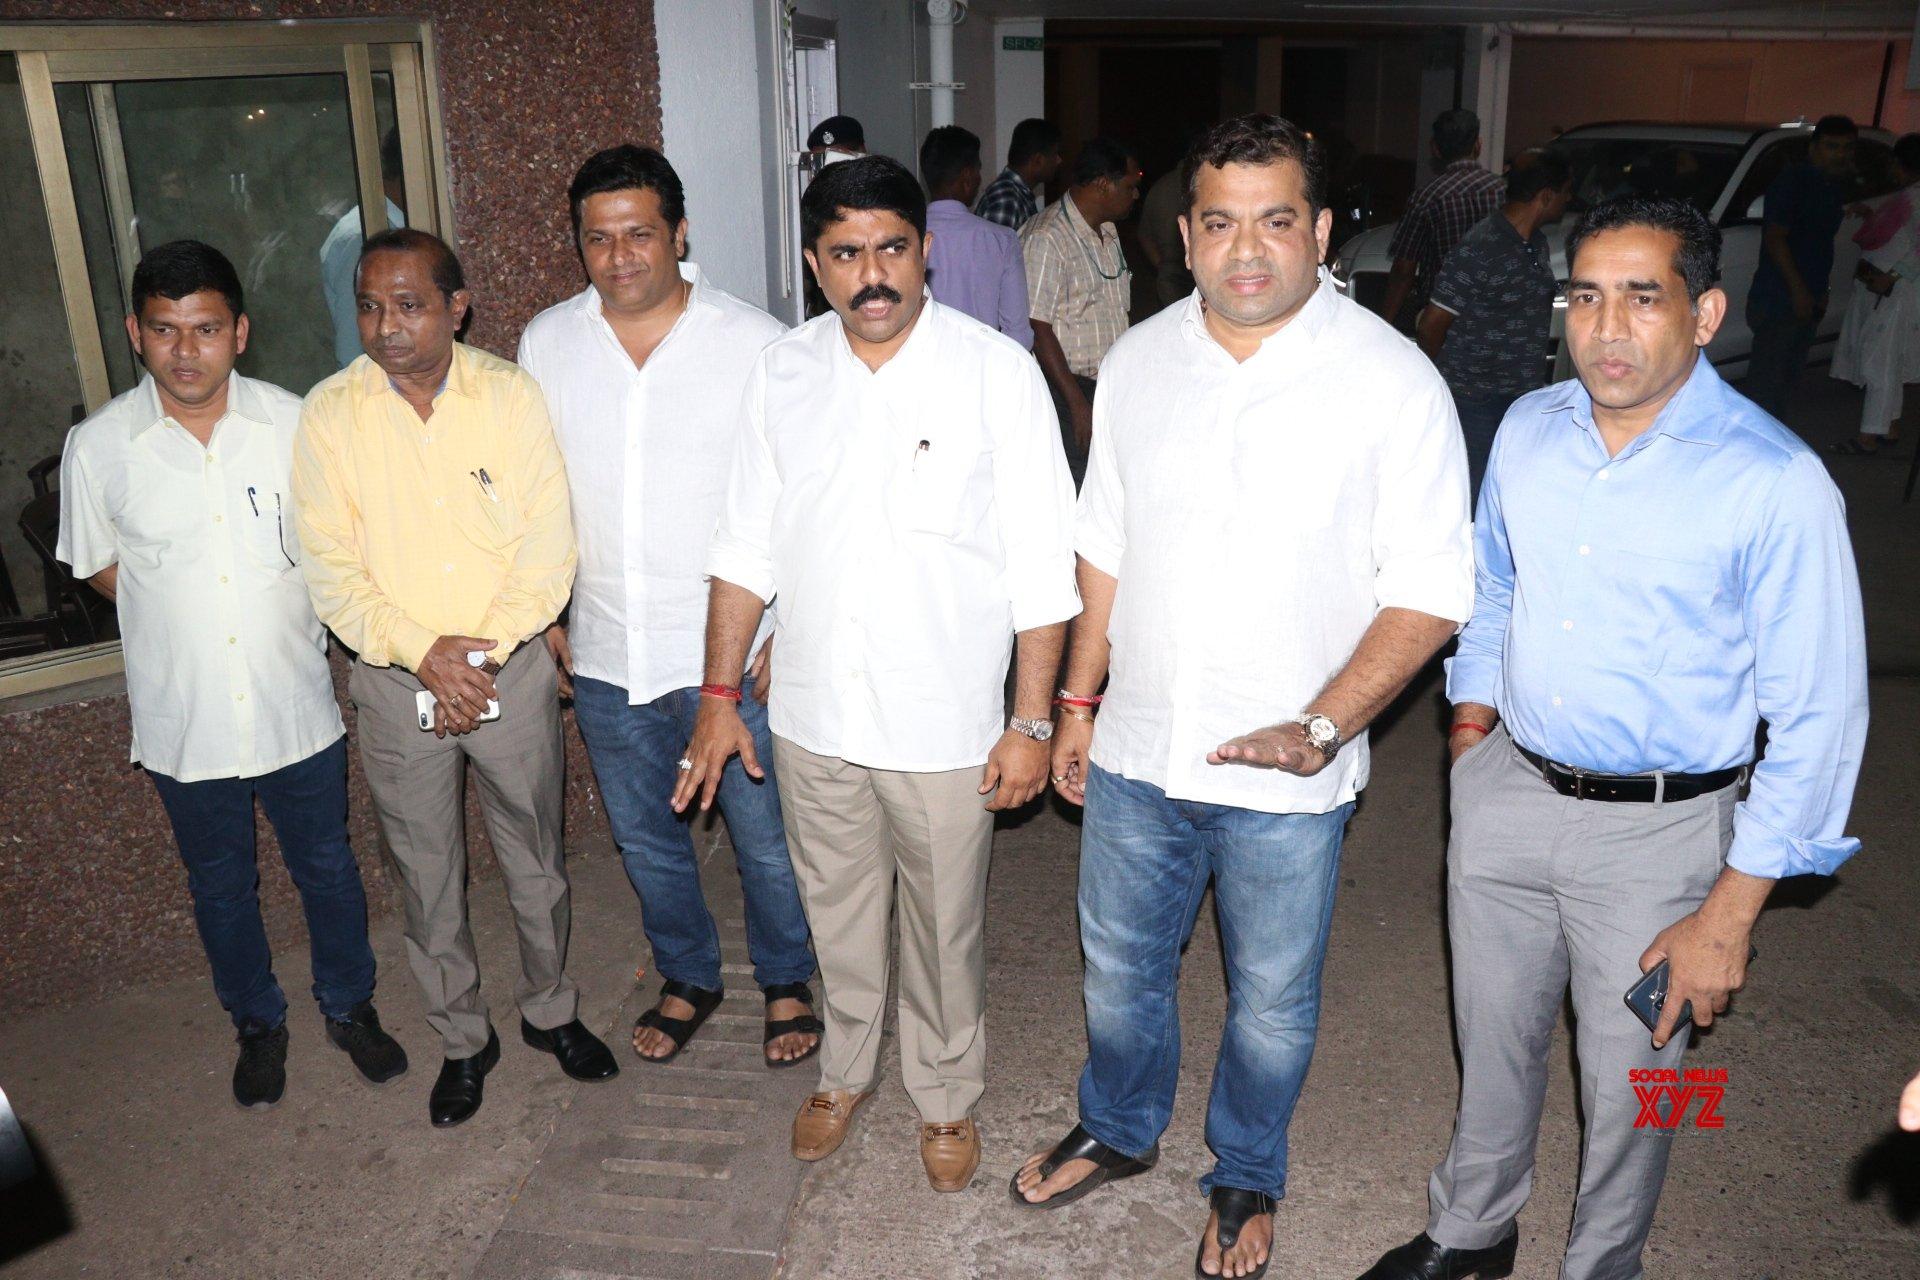 Panaji: Goa legislators meet Manohar Parrikar #Gallery